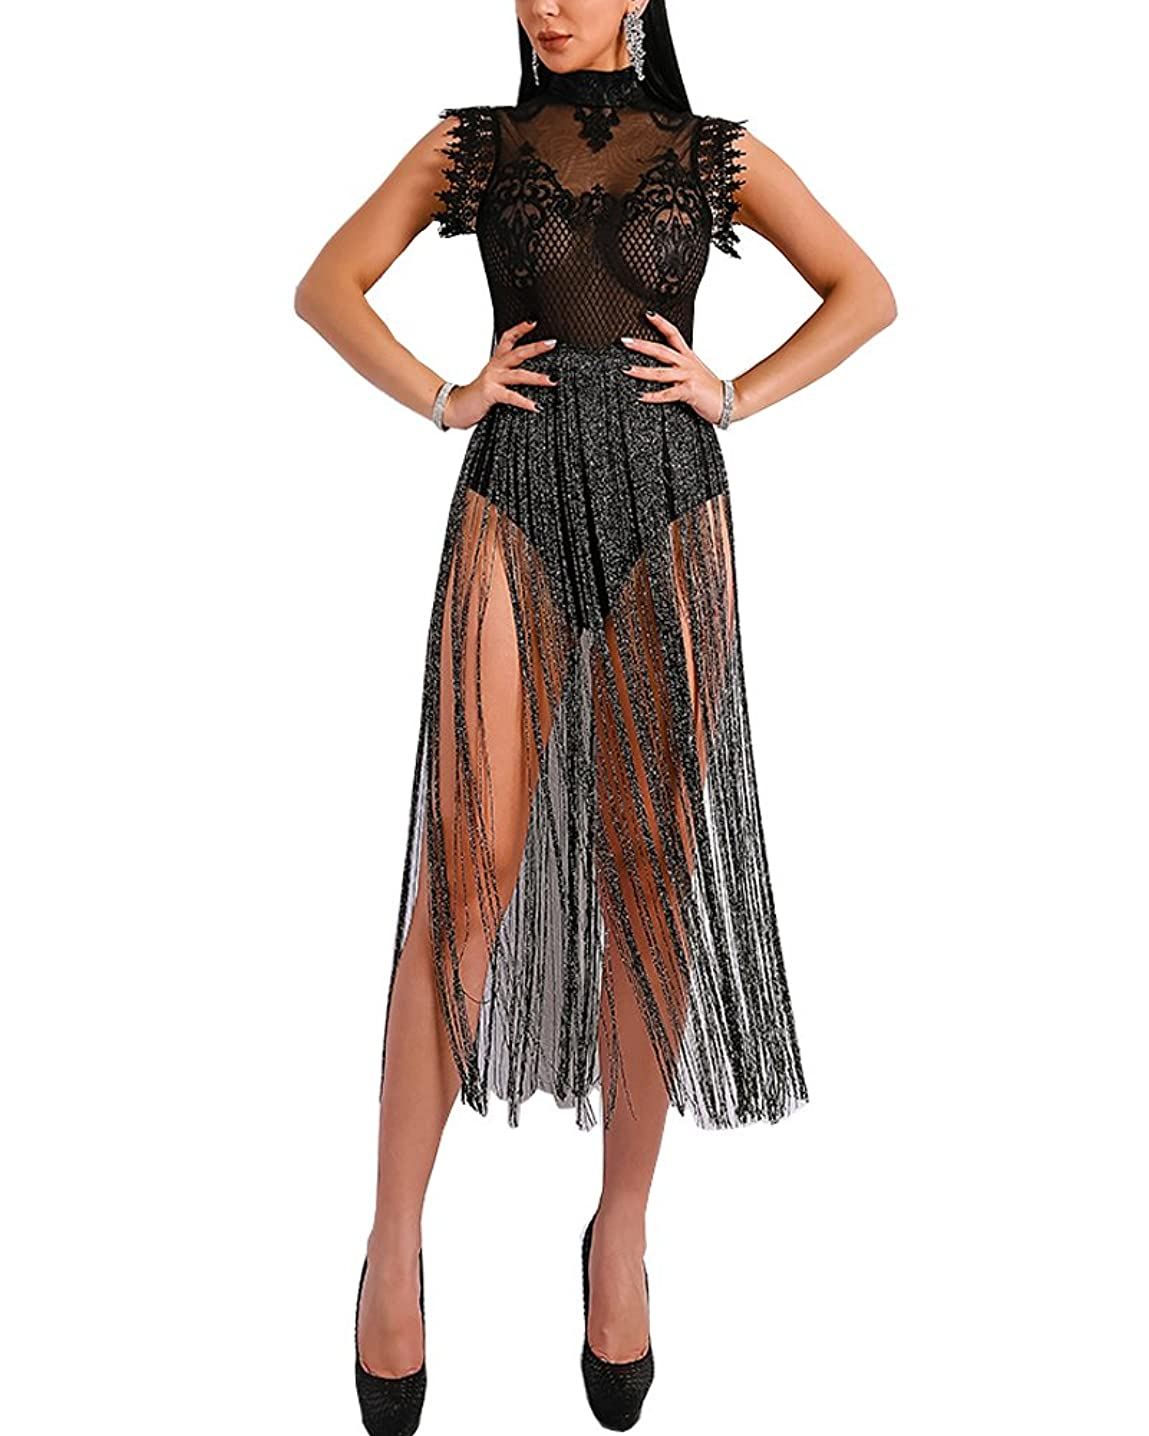 WRStore Women's Sexy Lace Sheer See Through Glitter Tassel Bodysuit Dress